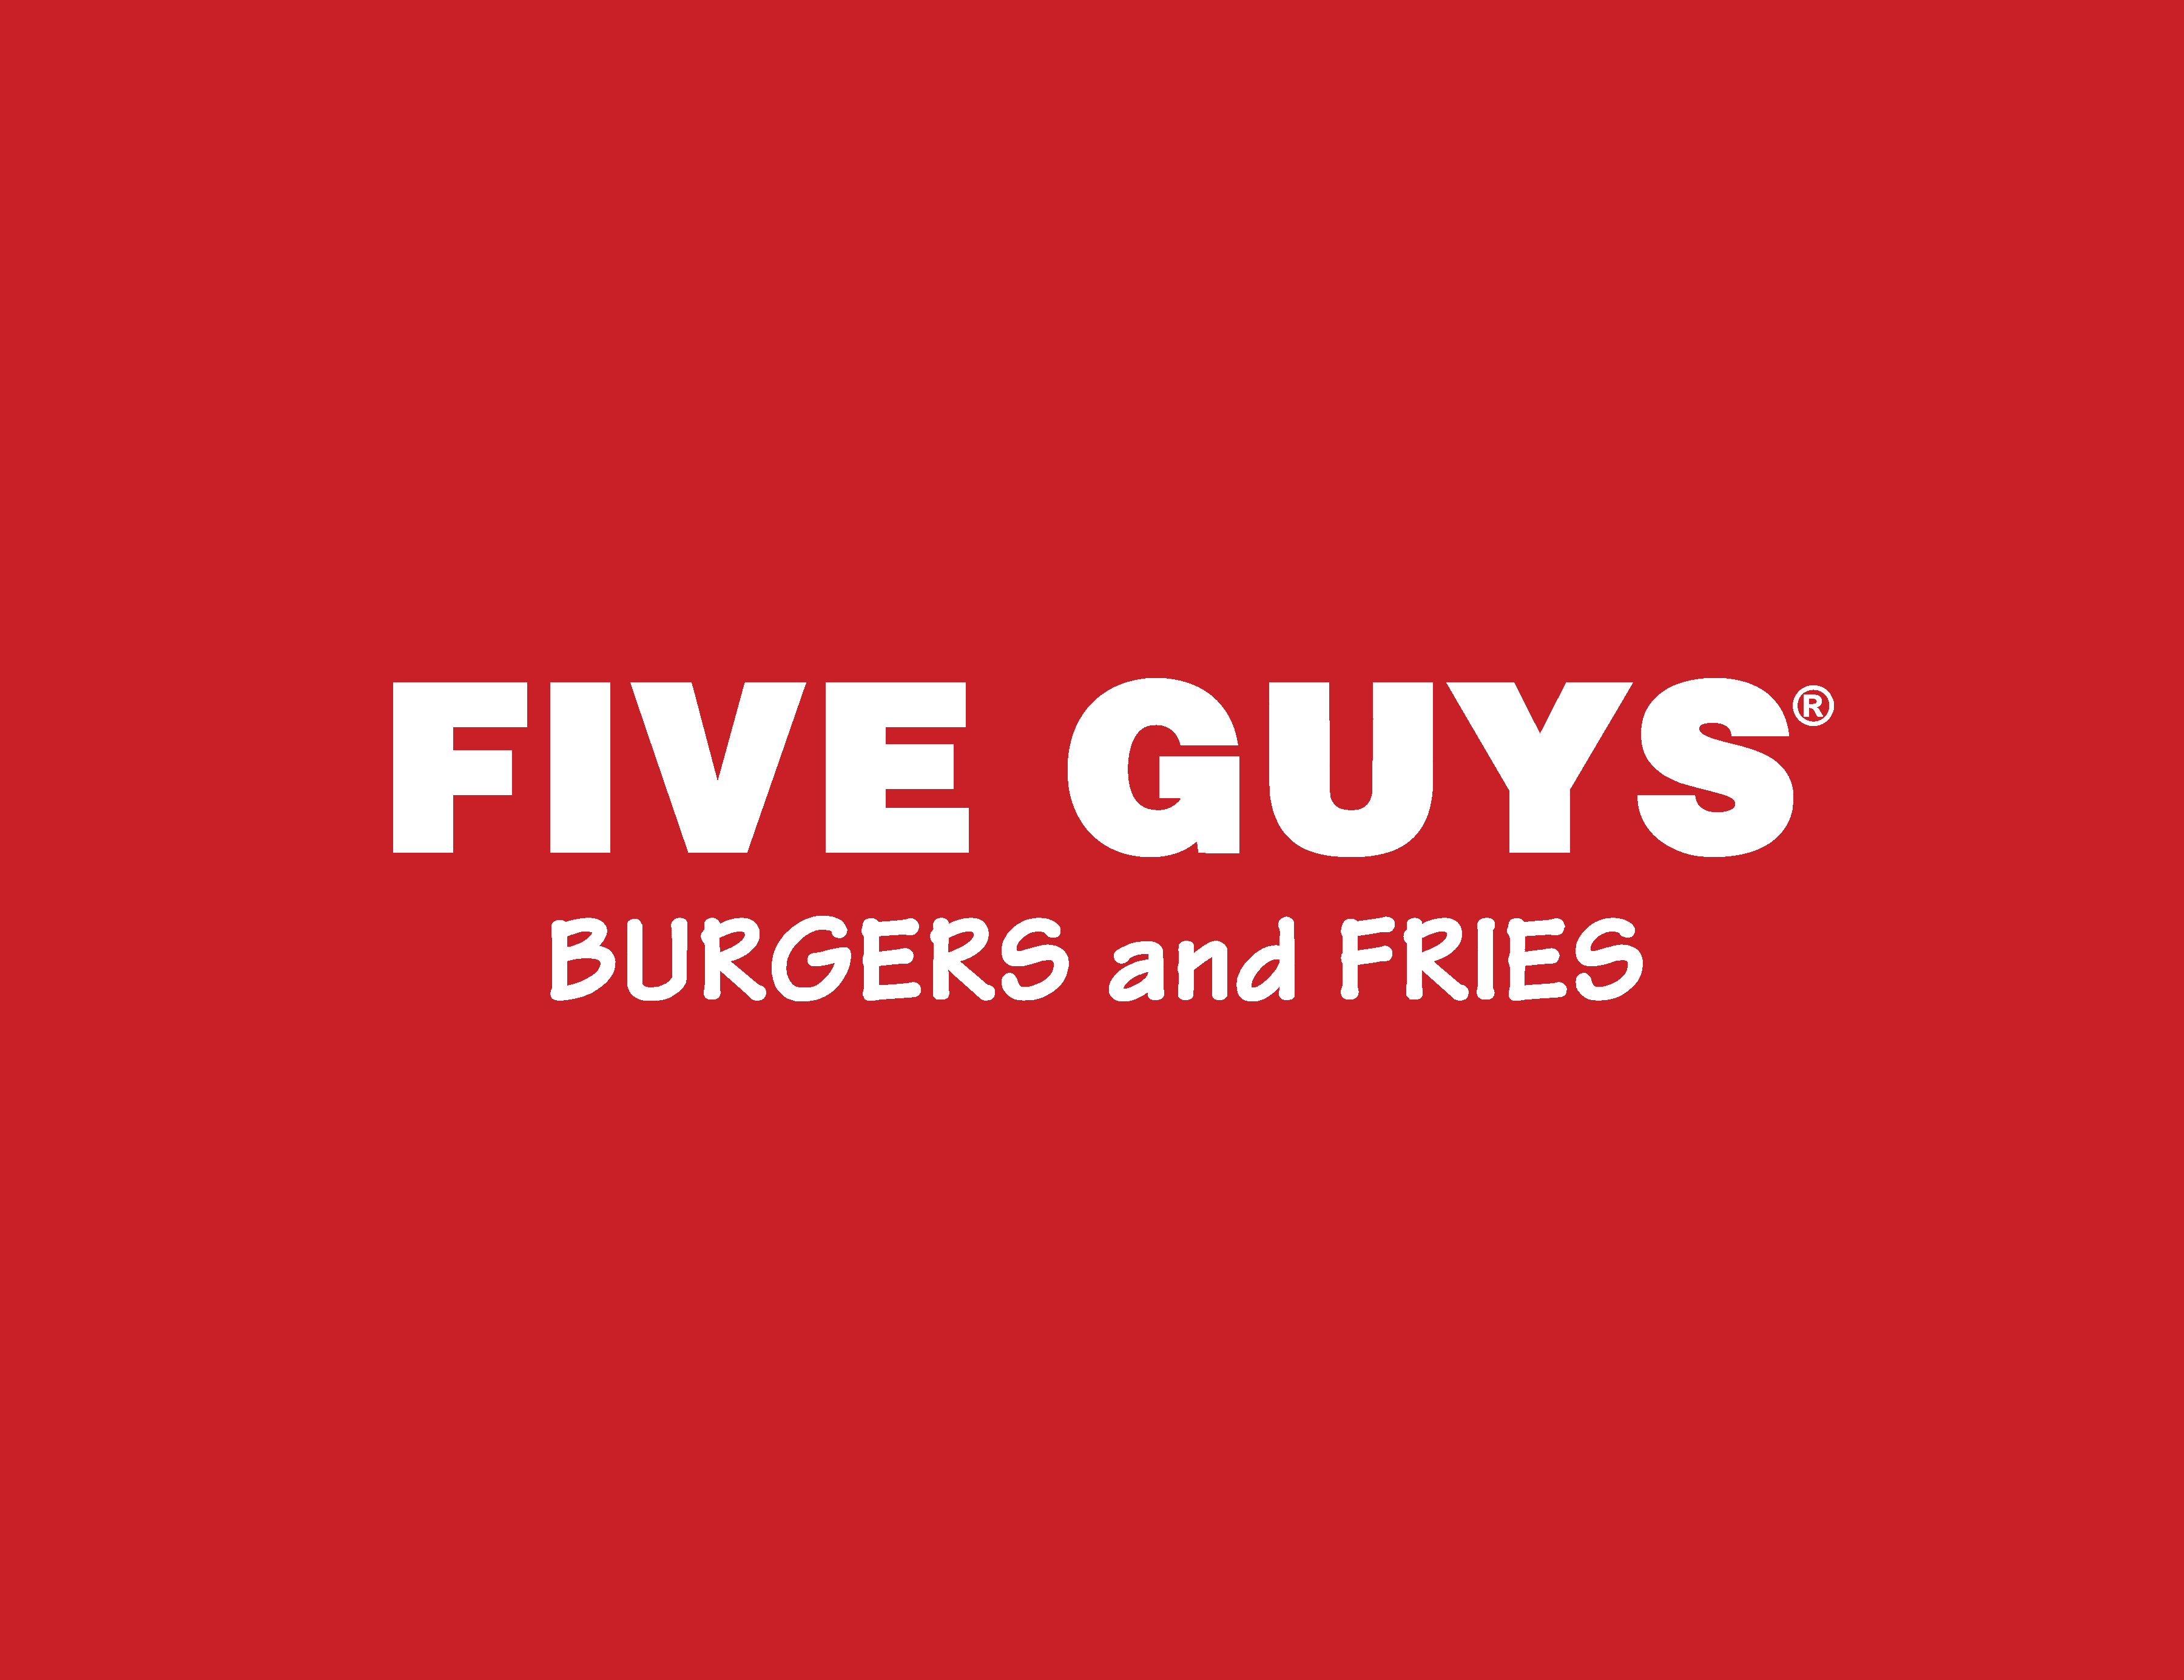 Five guys logo logotype burgers and fries